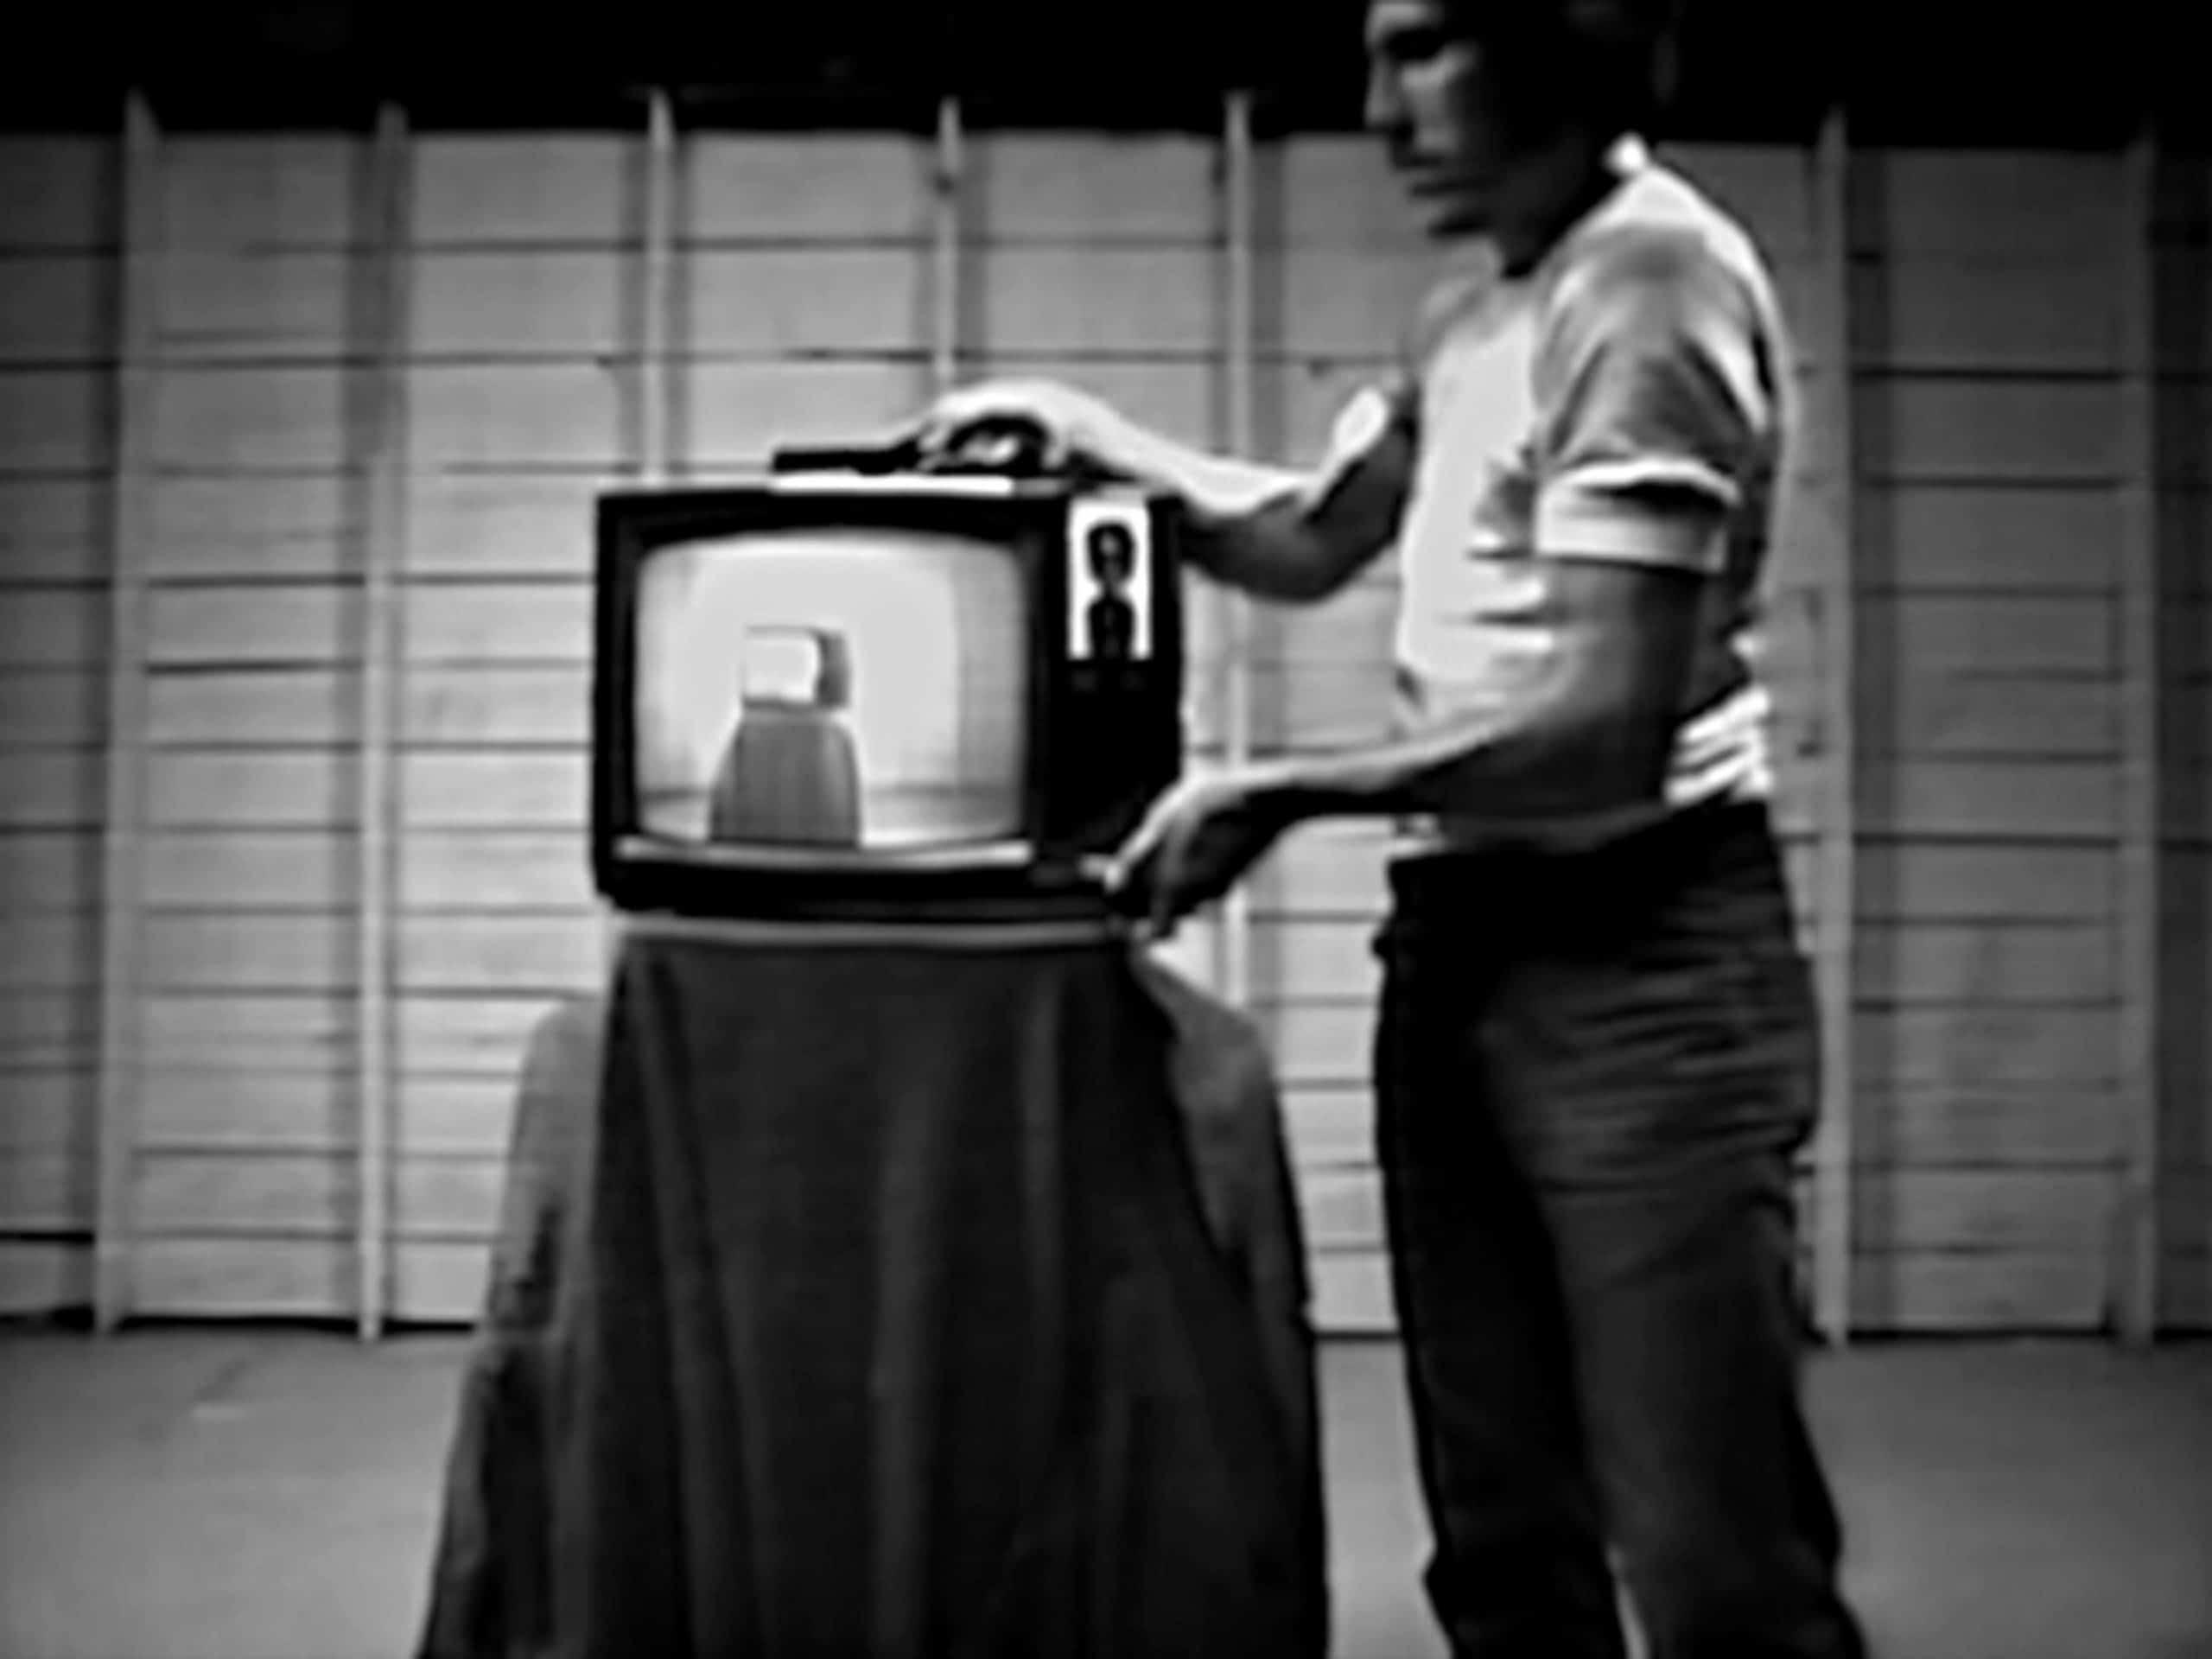 "James Byrne, Translucent, 1974, 2'15"", courtesy of Electronic Arts Intermix (EAI), New York"